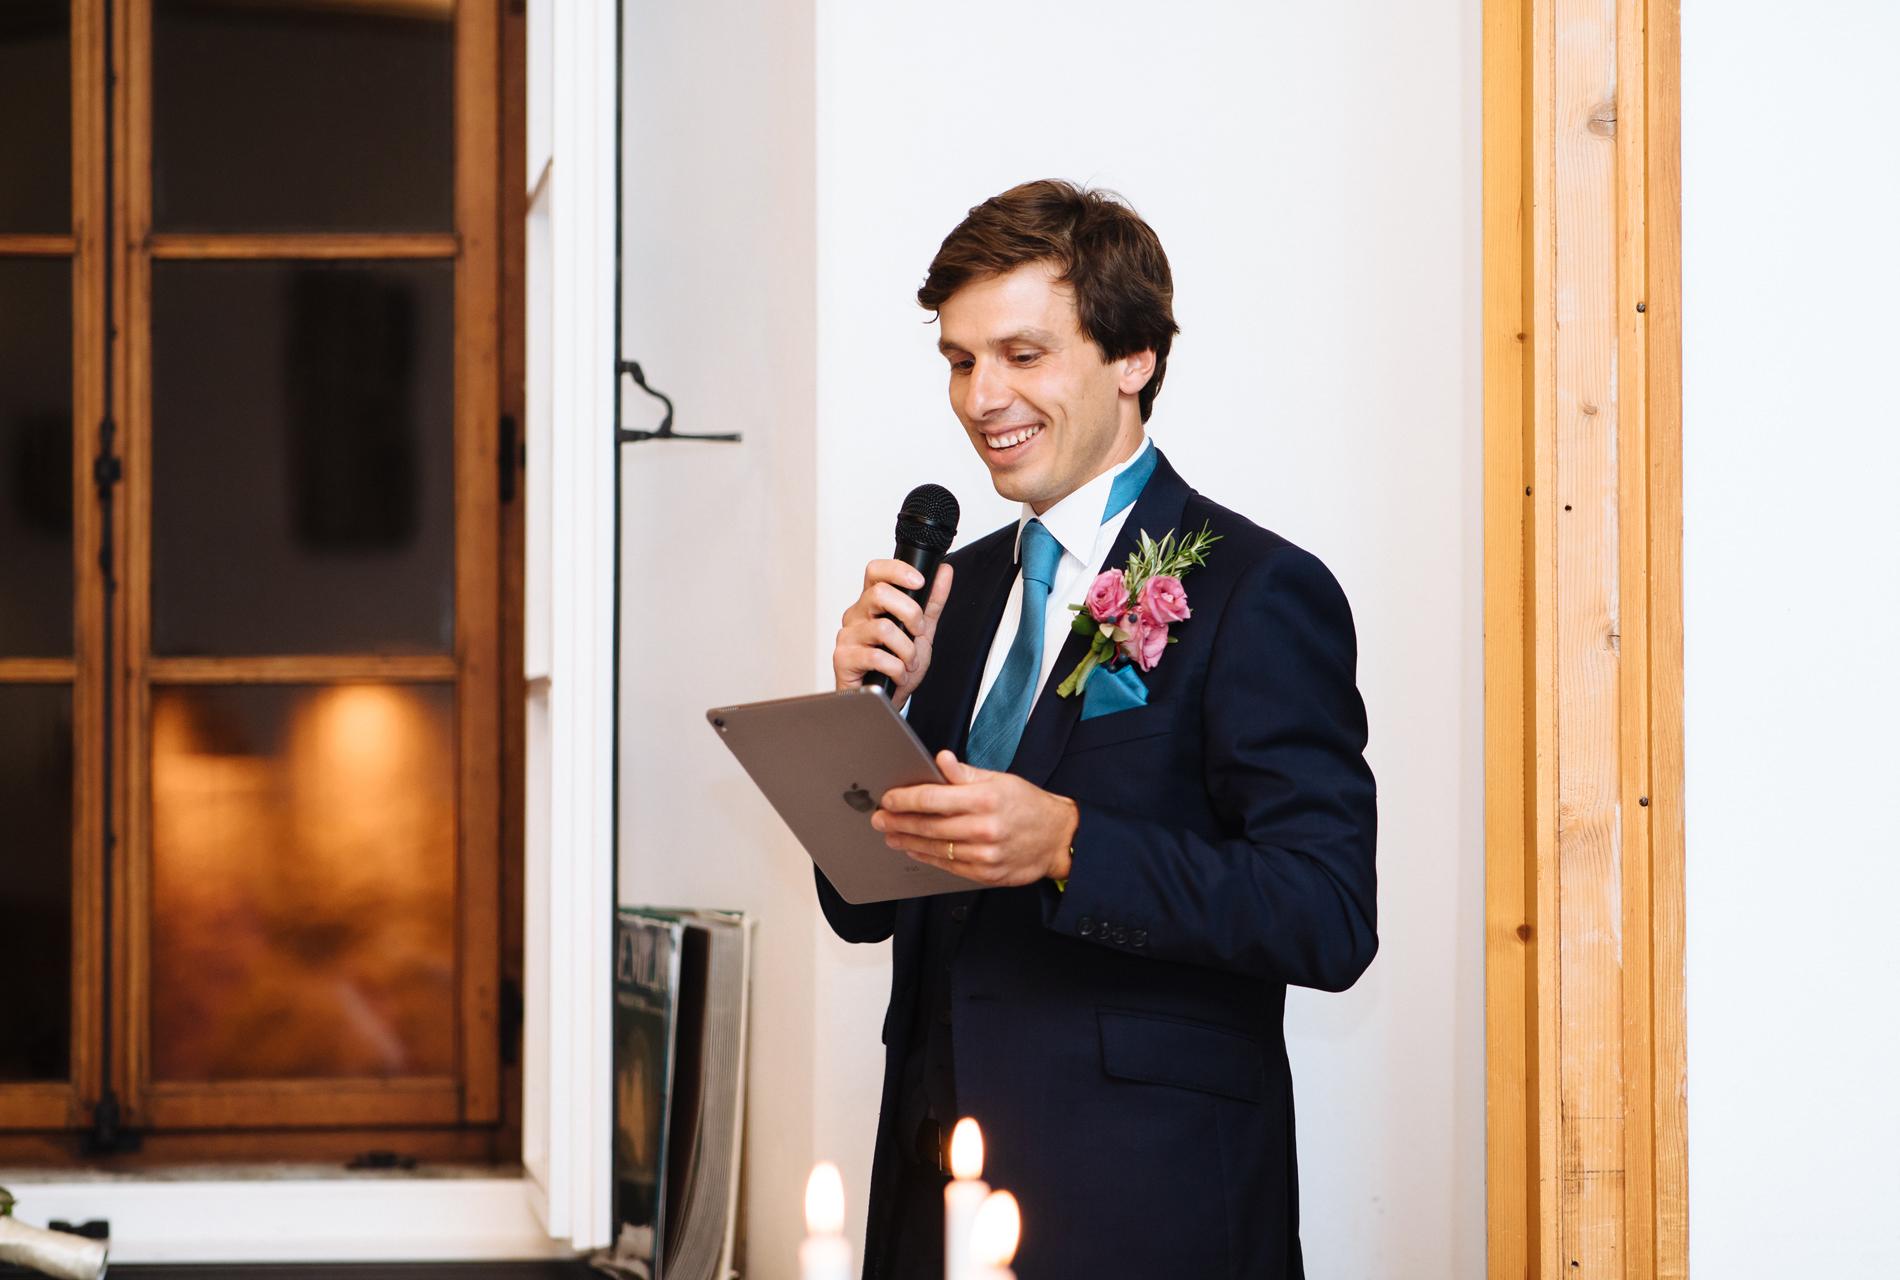 groom's speechesh